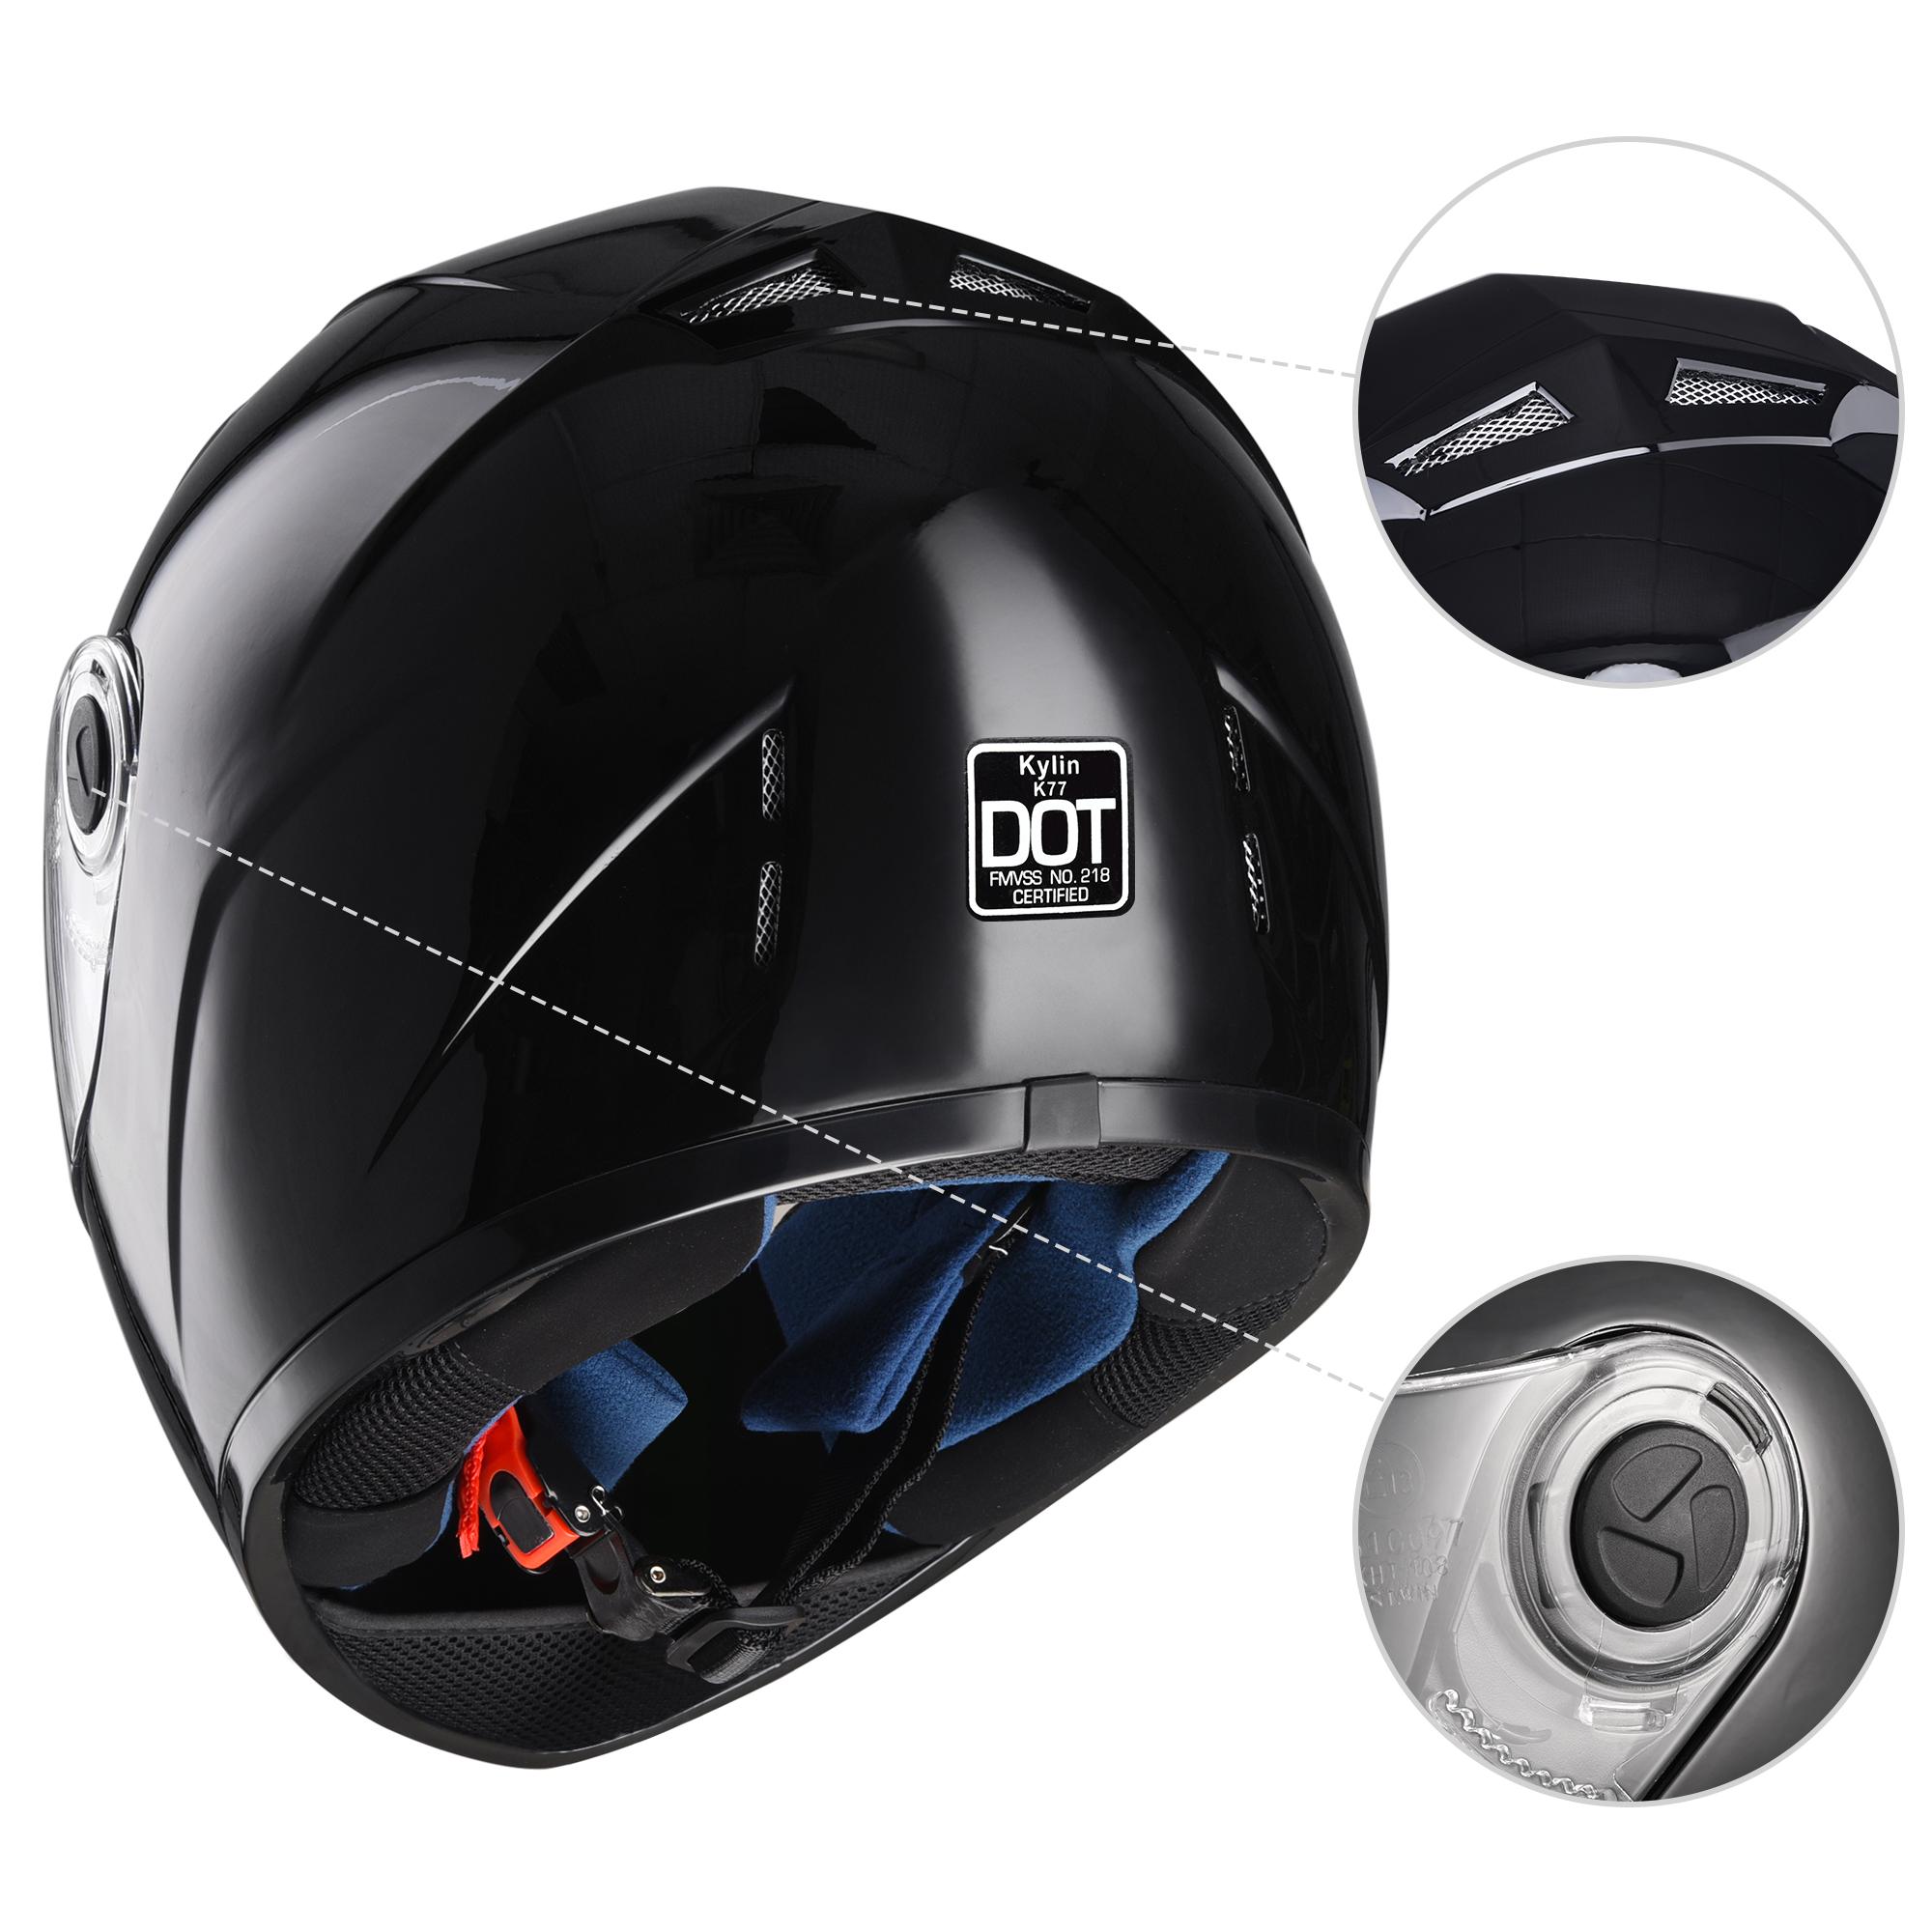 miniature 52 - AHR K12 Full Face Motorcycle Helmet DOT Air Vents Clear Visor Racing S M L XL